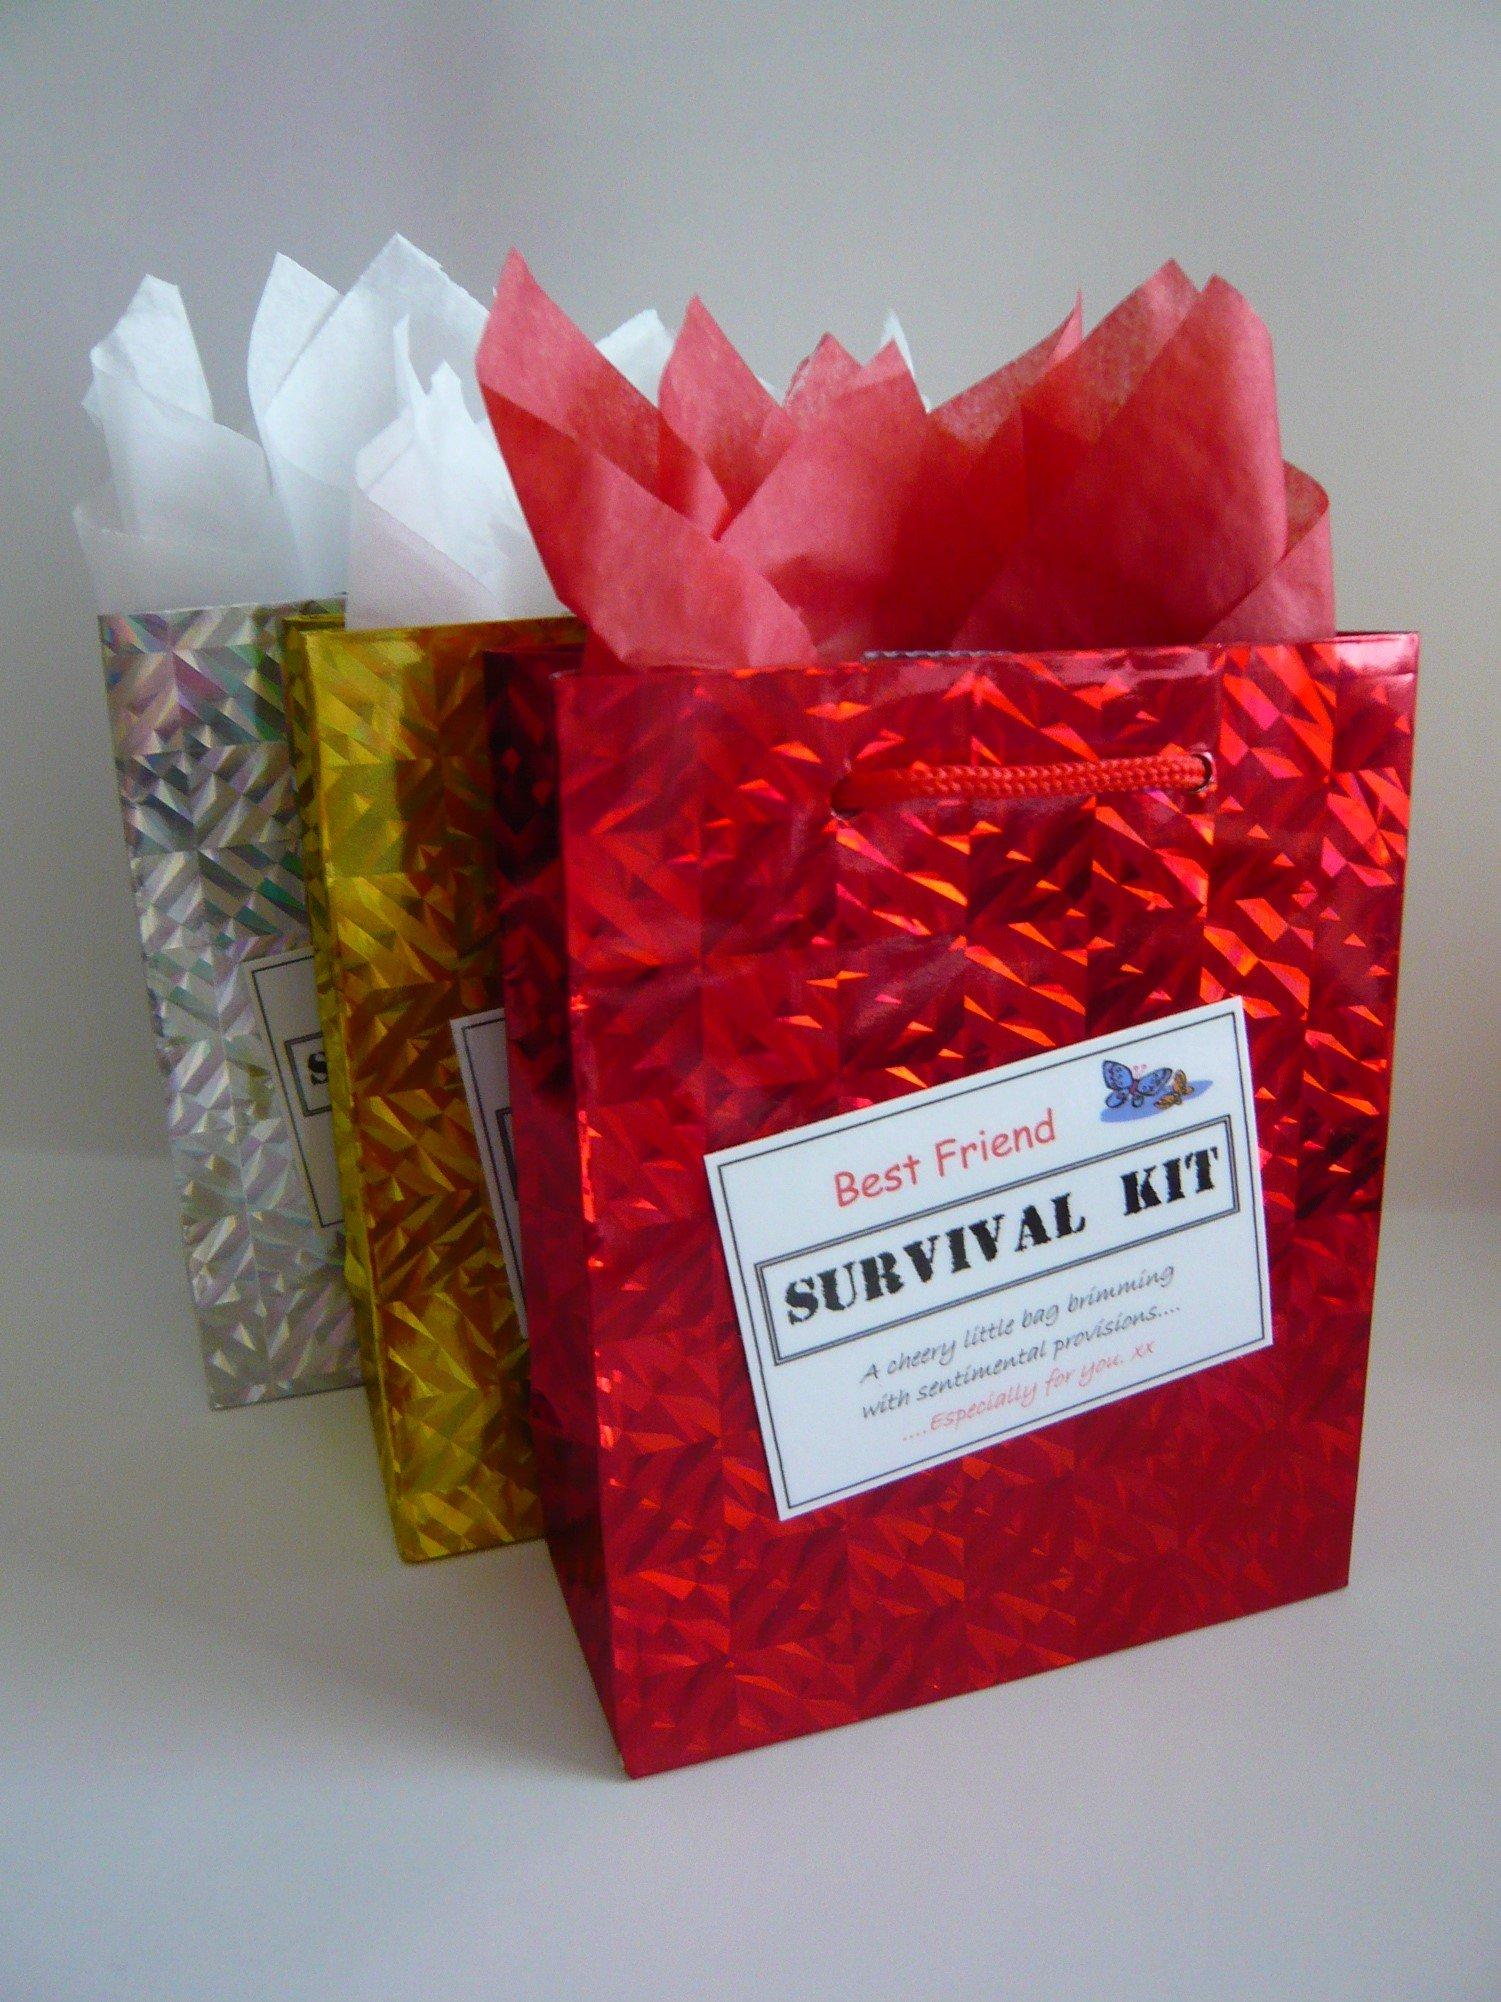 CHRISTMAS FRIEND Survival Kit large organza bag novelty gift